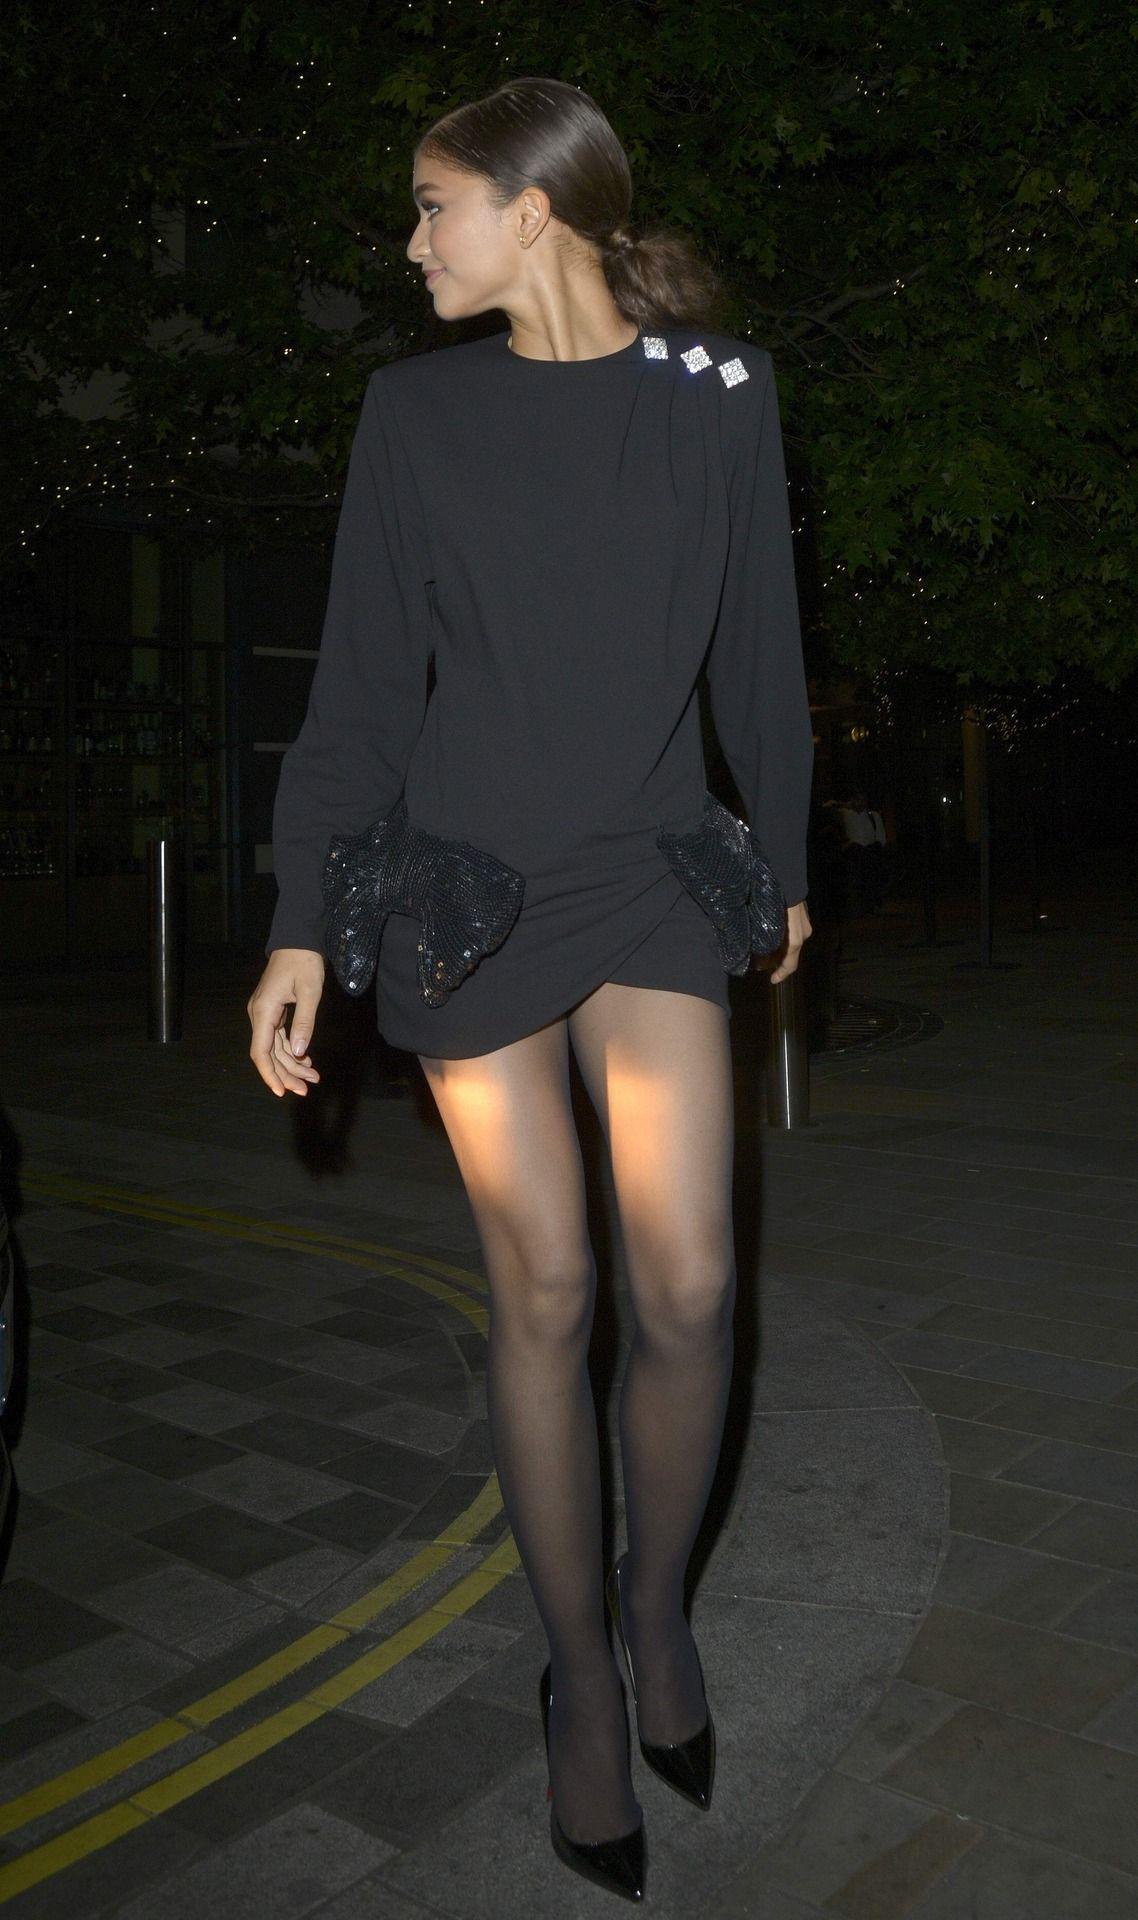 Zendaya In Sheer Stockings Photo Shoot nudes (27 image)